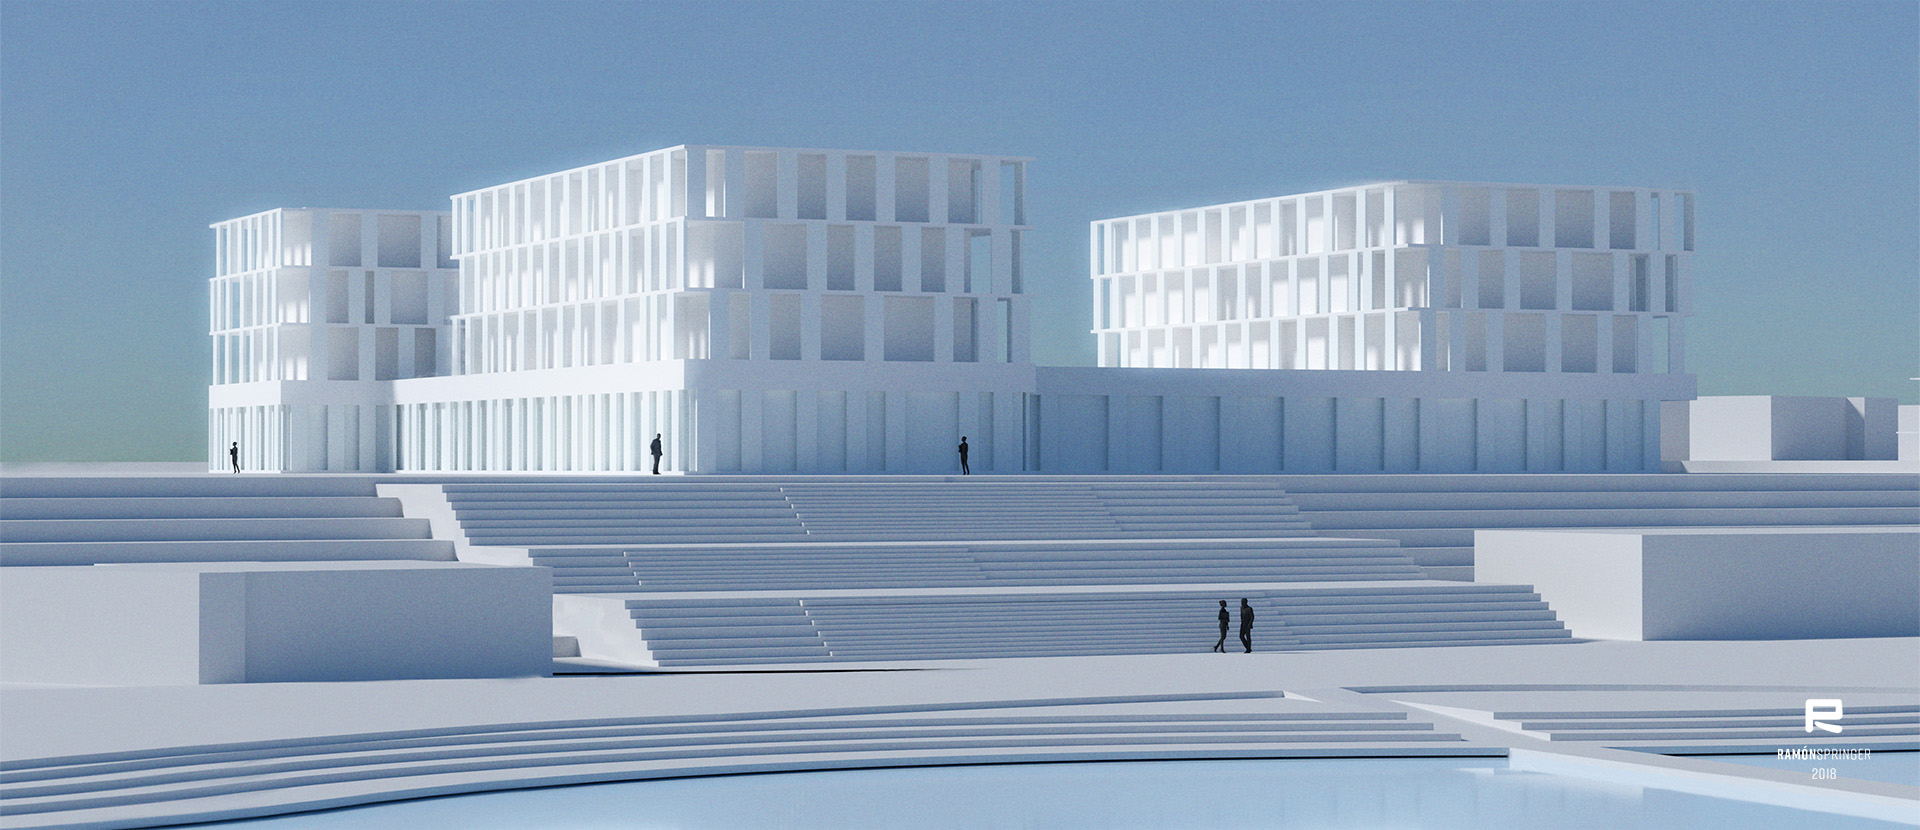 ARCHITECTURE_GROEMITZ_MAIN_VIEW_3D